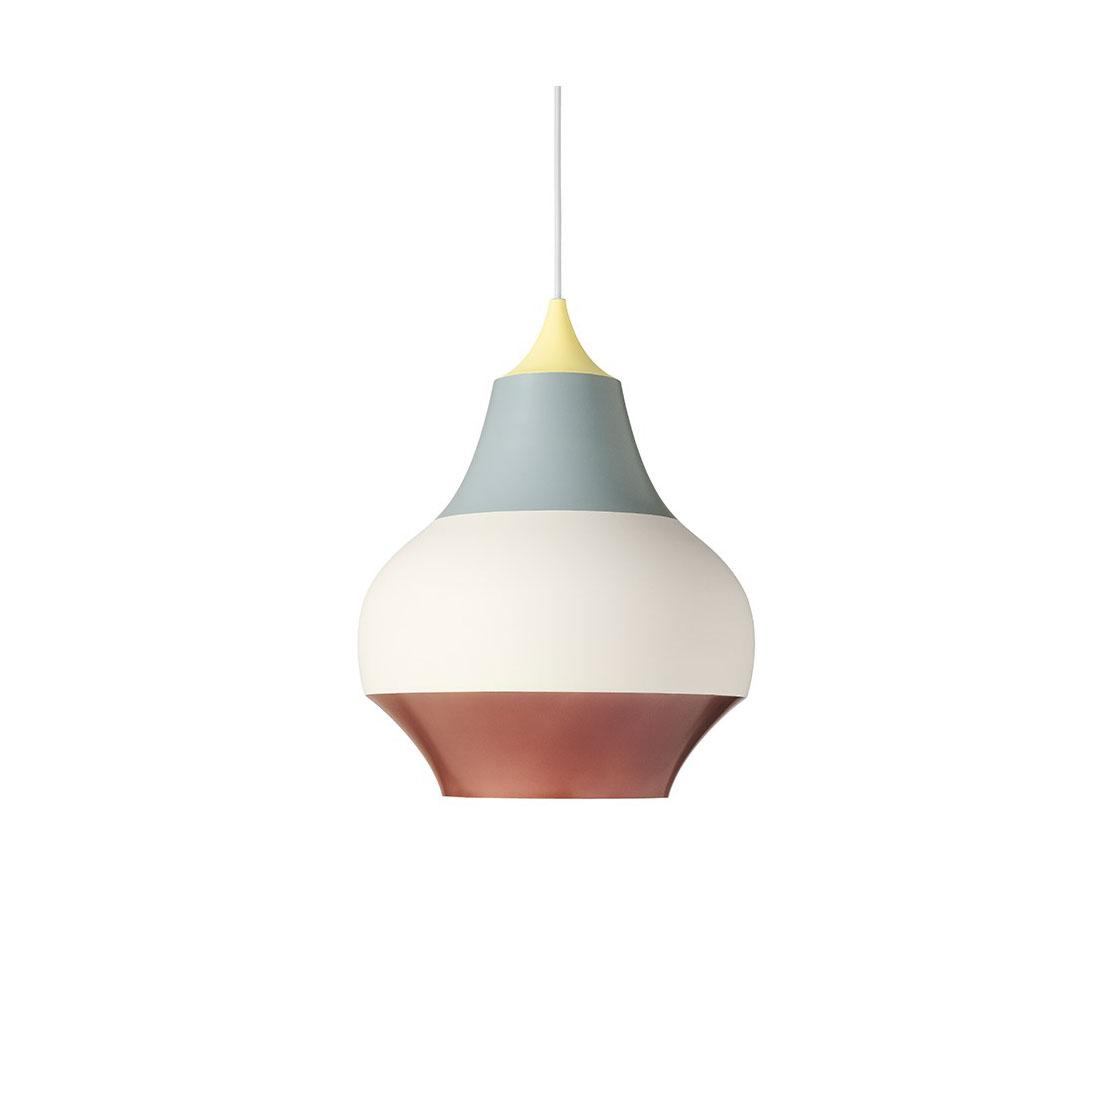 s vedalens belysning louis poulsen cirque 380 gul s vedalens belysning. Black Bedroom Furniture Sets. Home Design Ideas